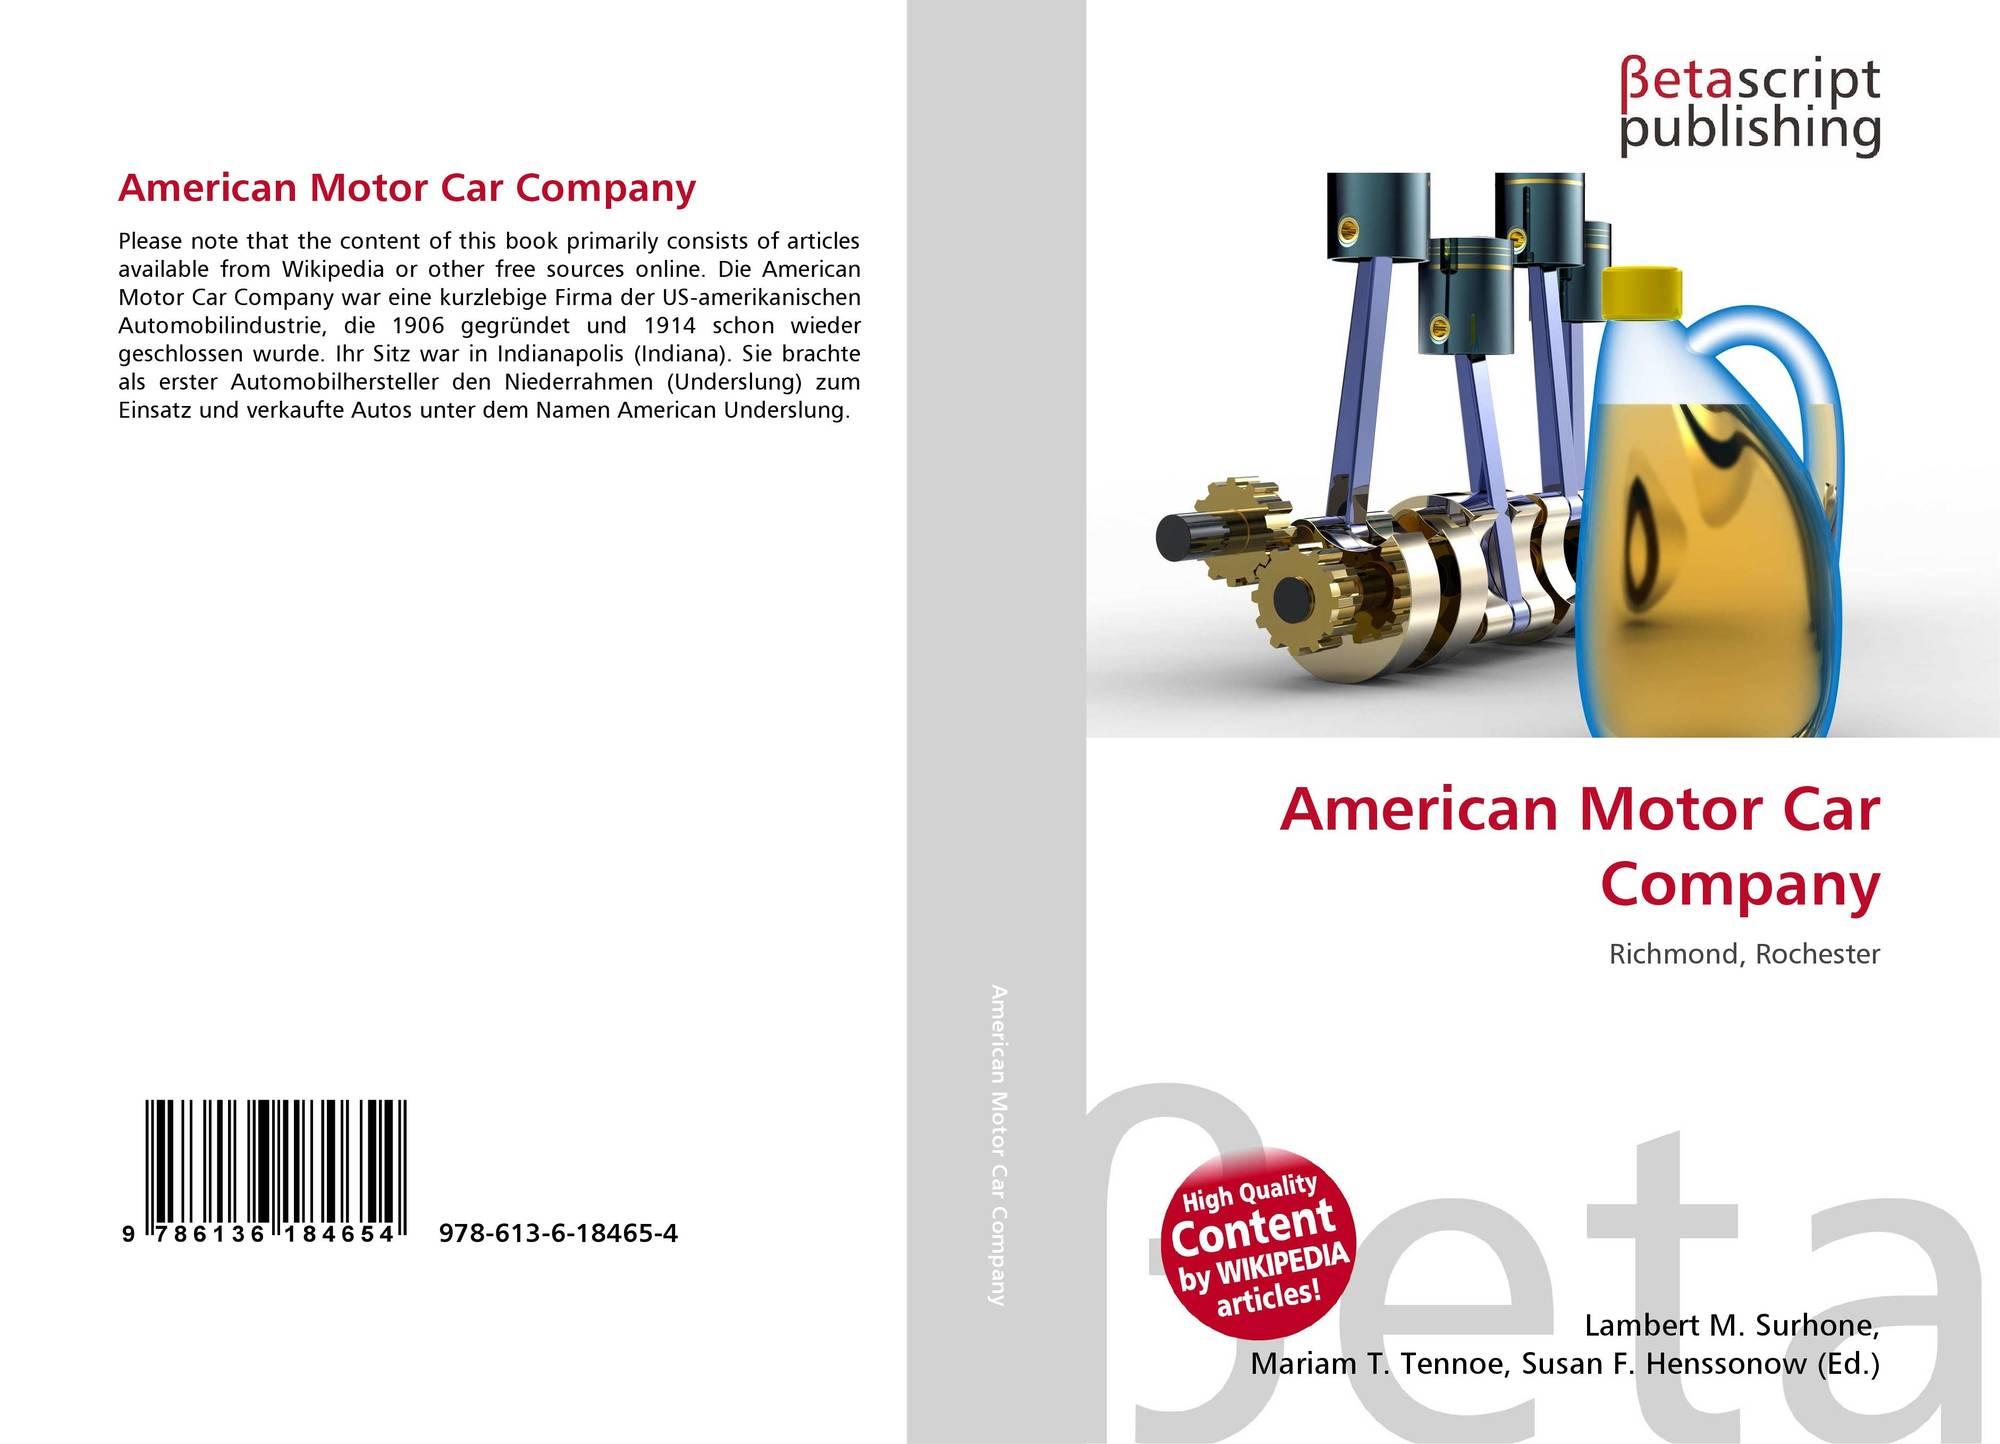 American Motor Car Company 978 613 6 18465 4 6136184656